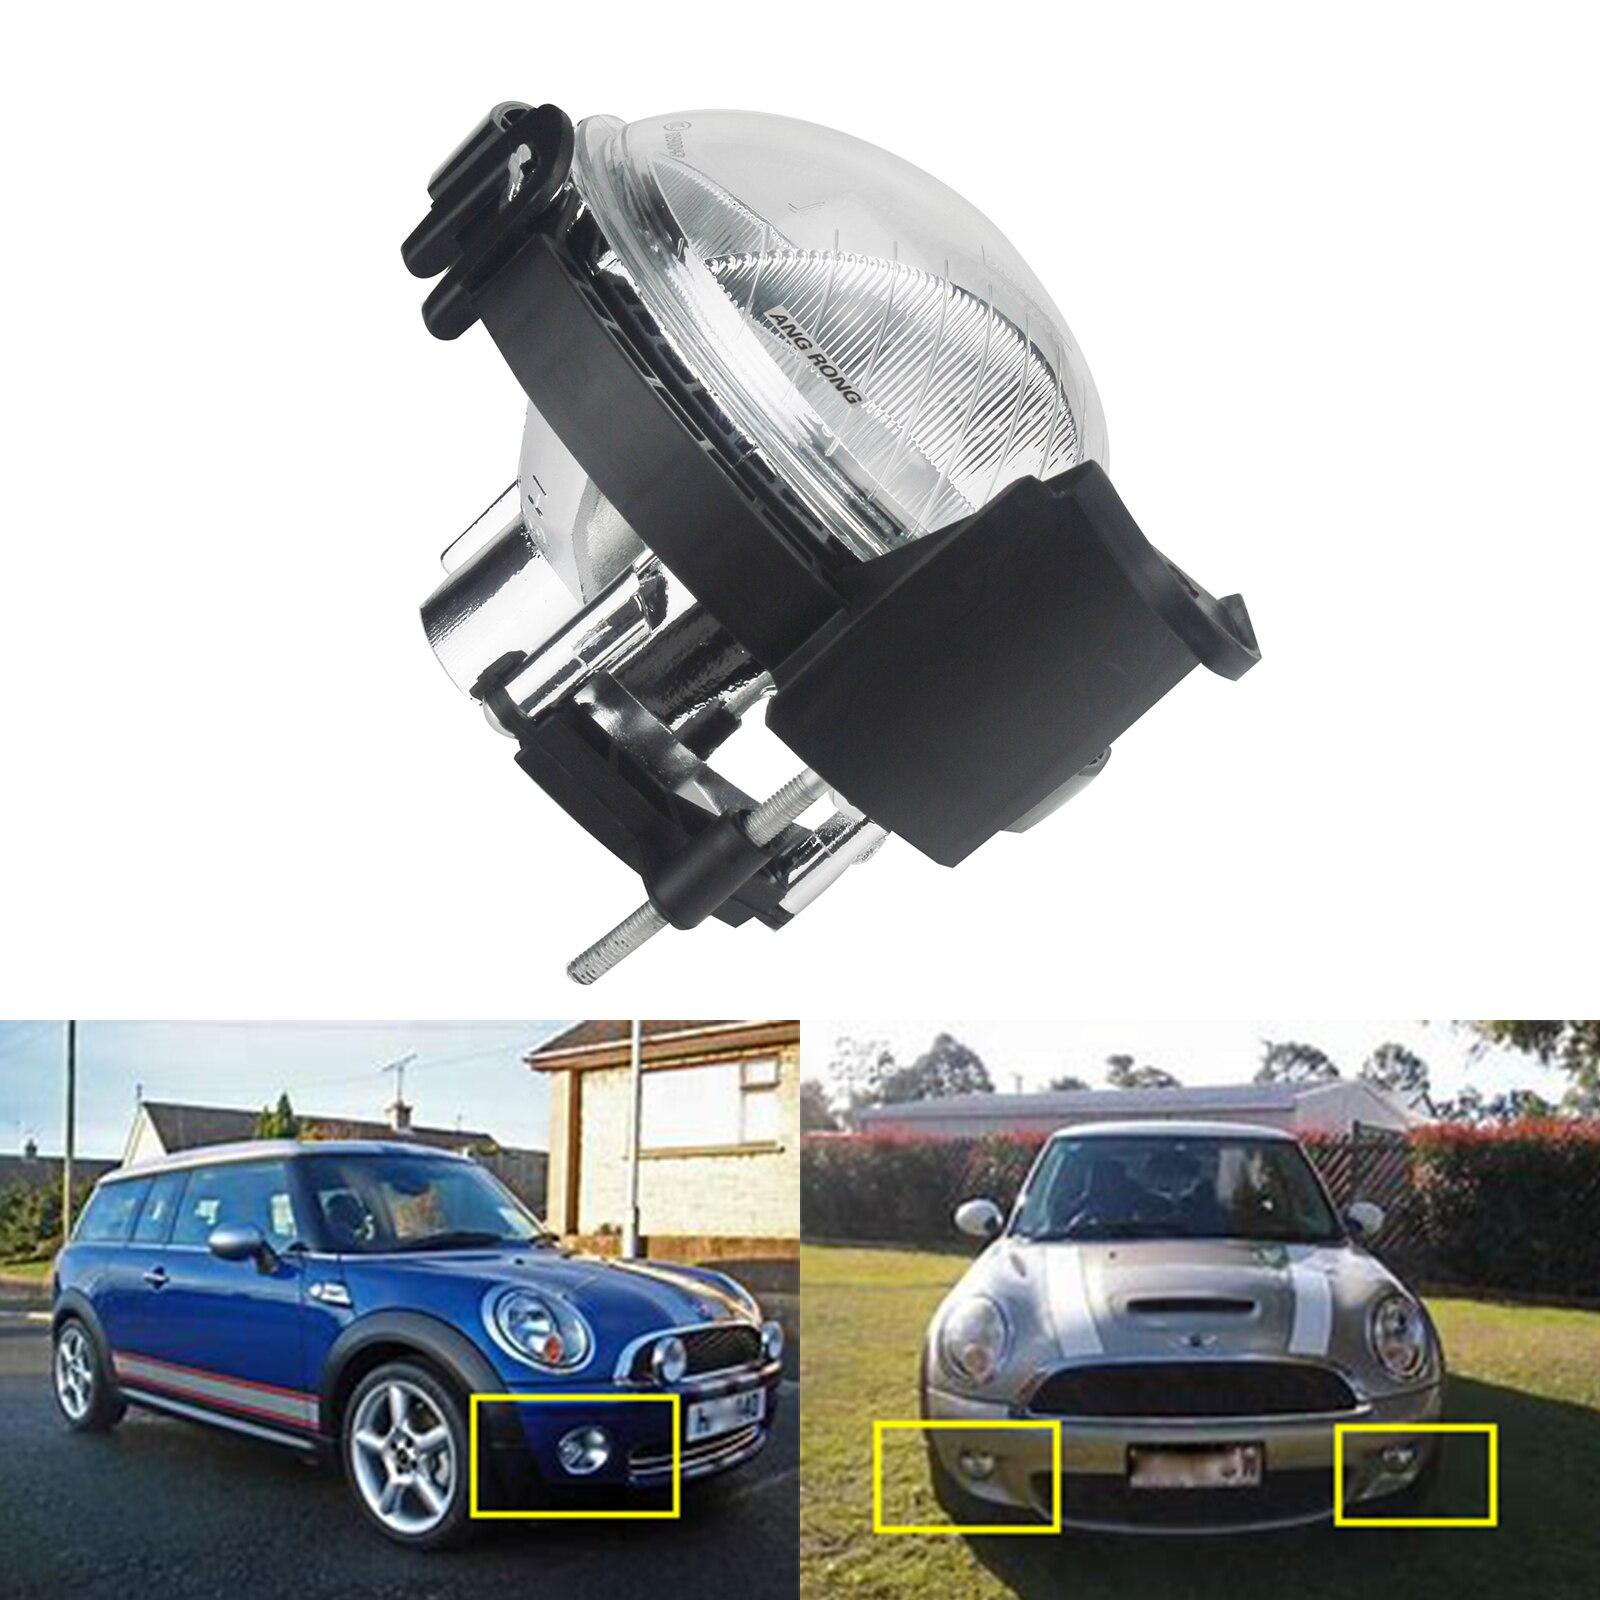 ANGRONG 1pc Left/Right Bumper Fog Light No Bulb For BMW Mini R55-R59 Cooper S Countryman rastar bmw mini cooper s countryman 1 14 радиоуправляемый автомобиль с usb зарядкой игрушки для мальчиков 72560 красный